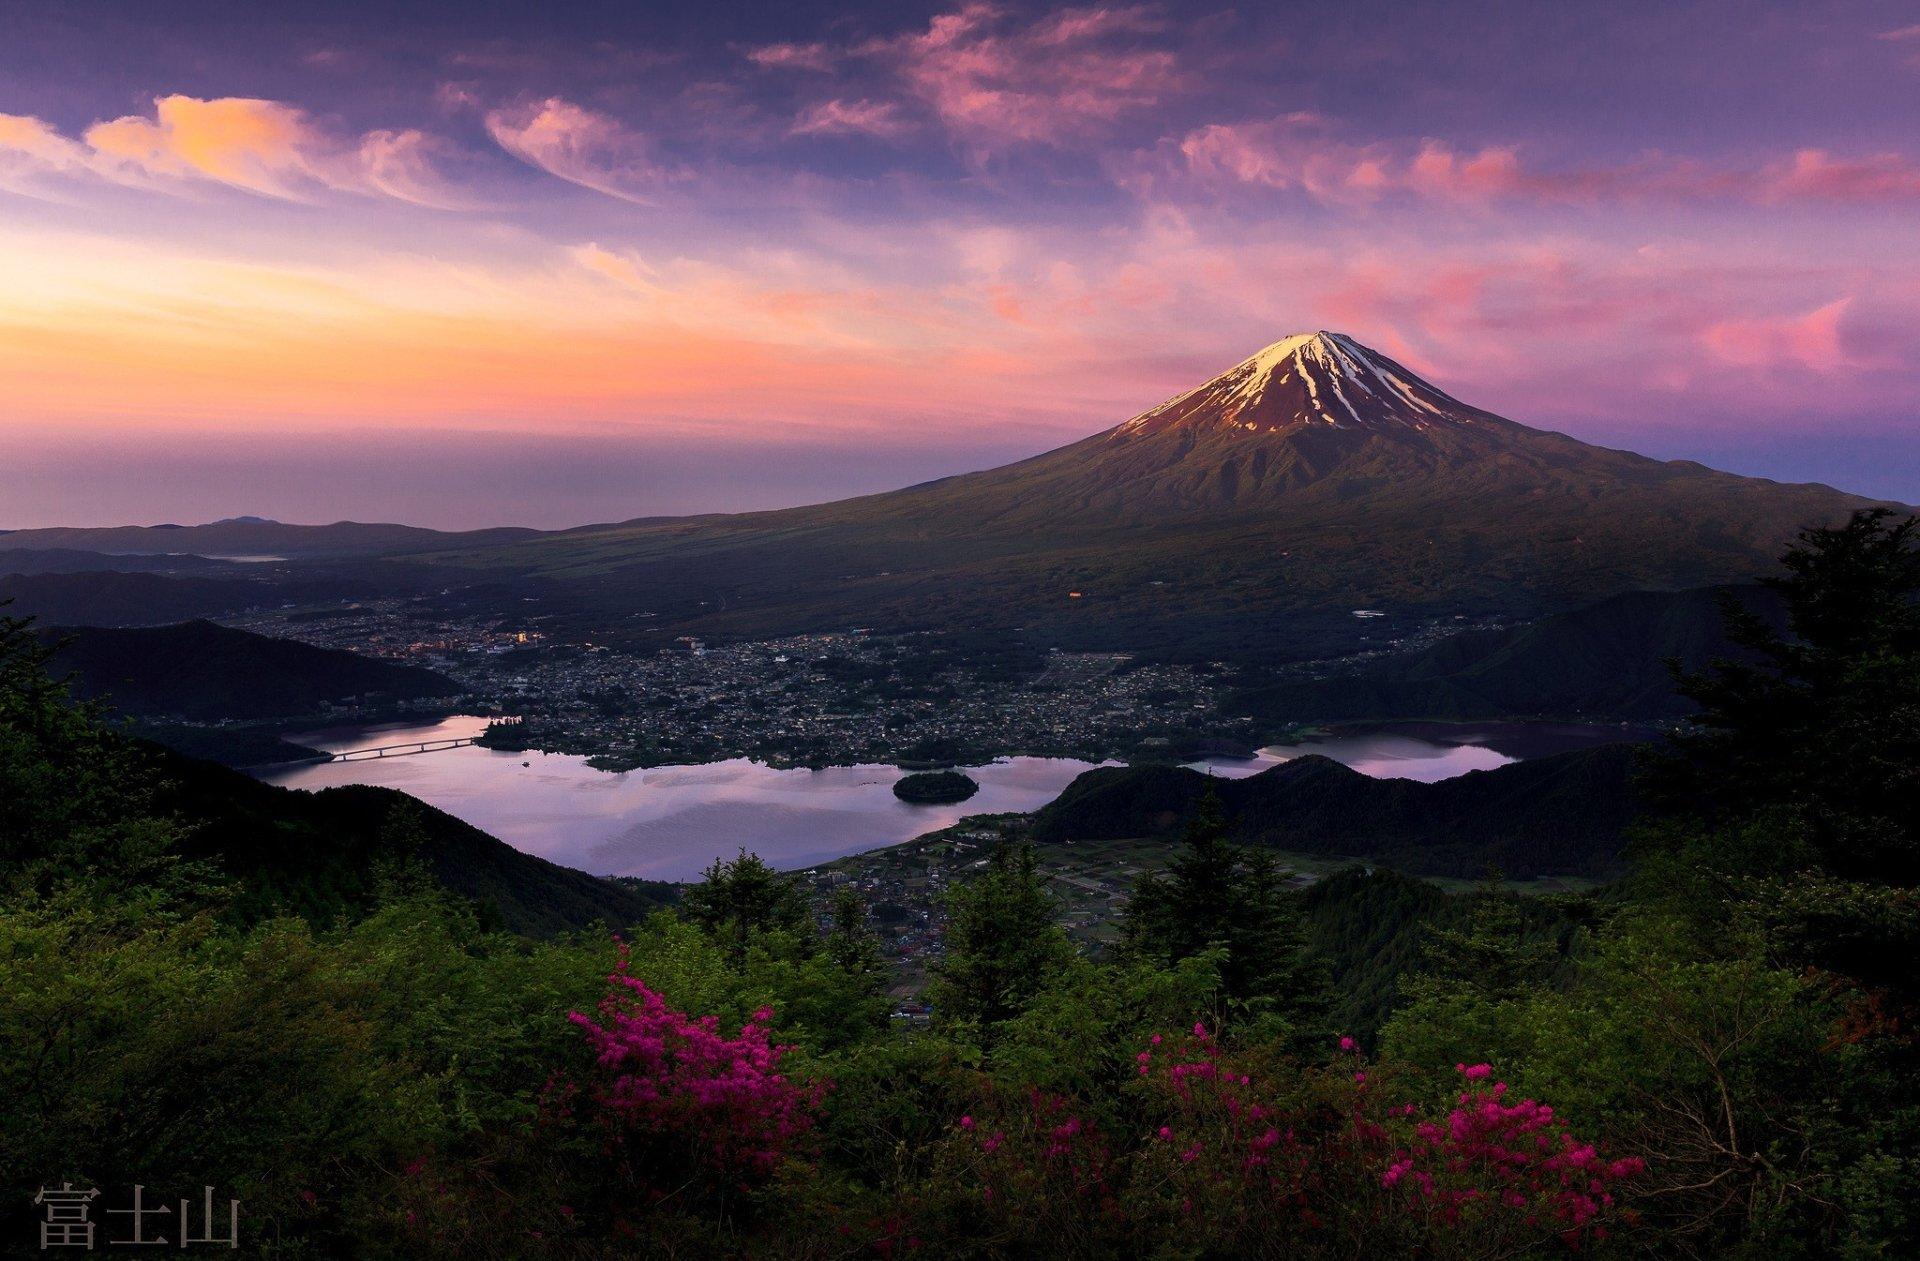 Mount Fuji Wallpaper Iphone Fujiyama Sunrise Hd Wallpaper Background Image